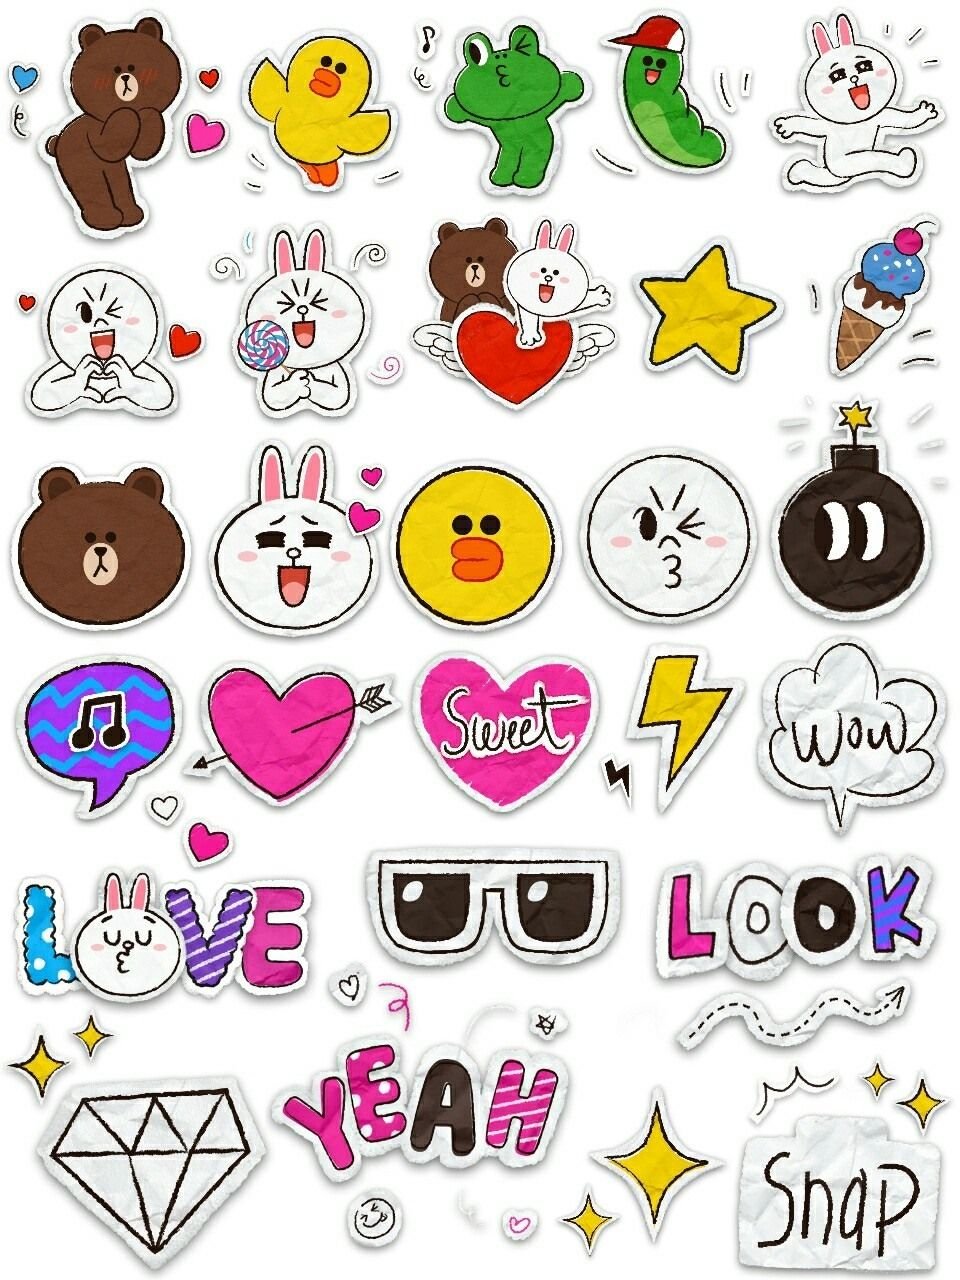 Cute Food Printable Stickers Tumblr Lucu Stiker Lucu